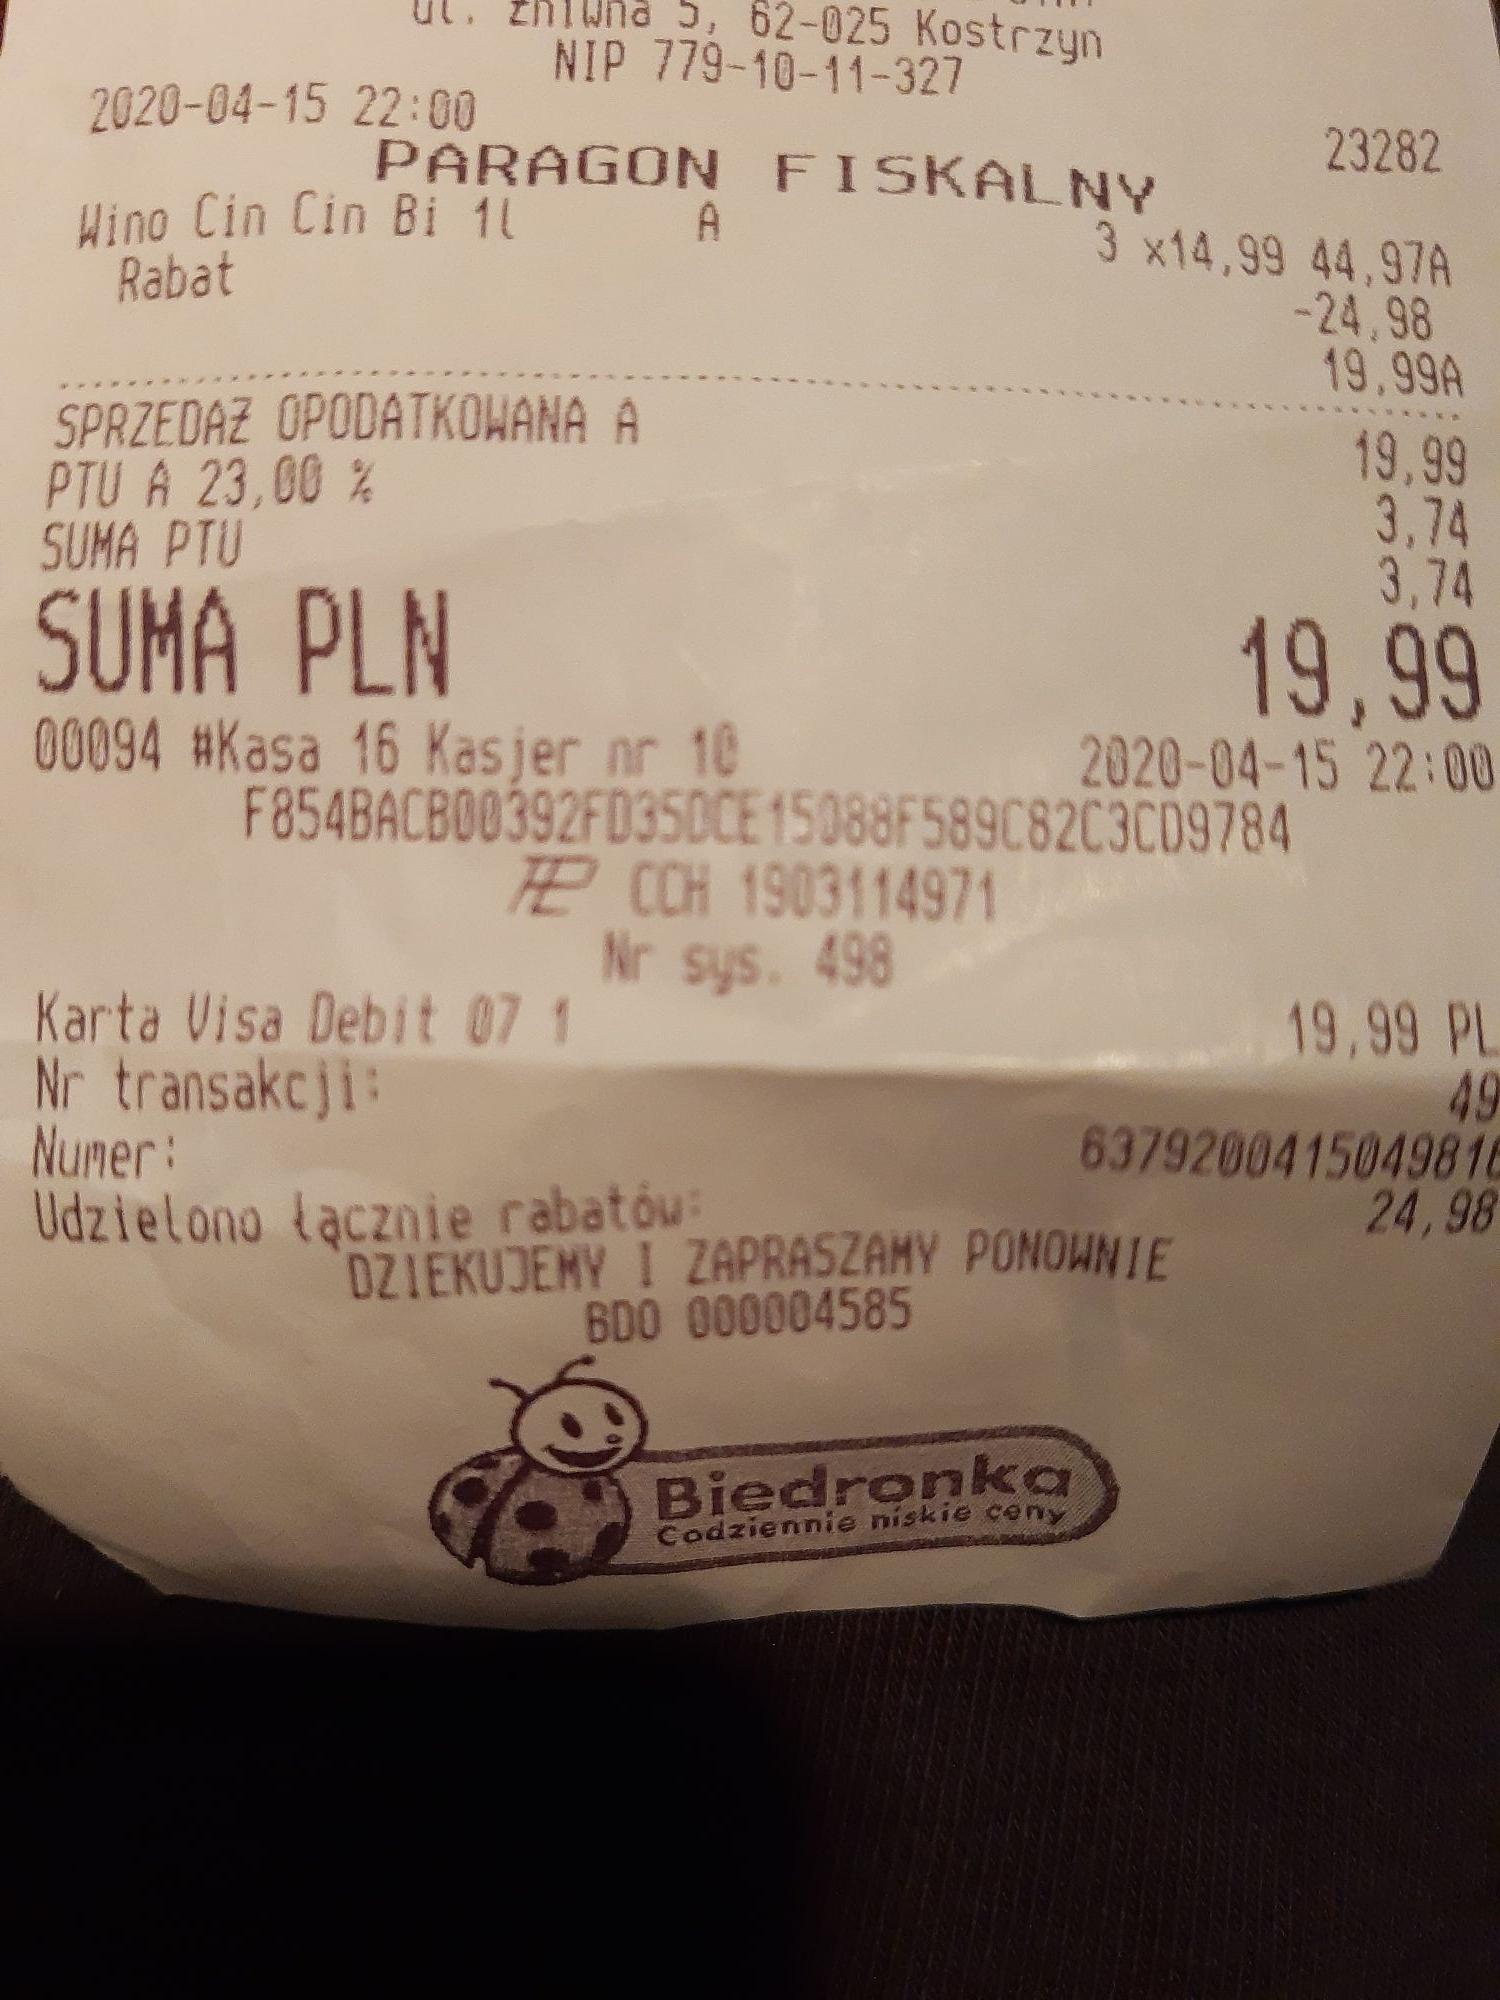 Blad Cenowy Biedronka 3 Cin Cin Bianco Za 19 99 Pepper Pl